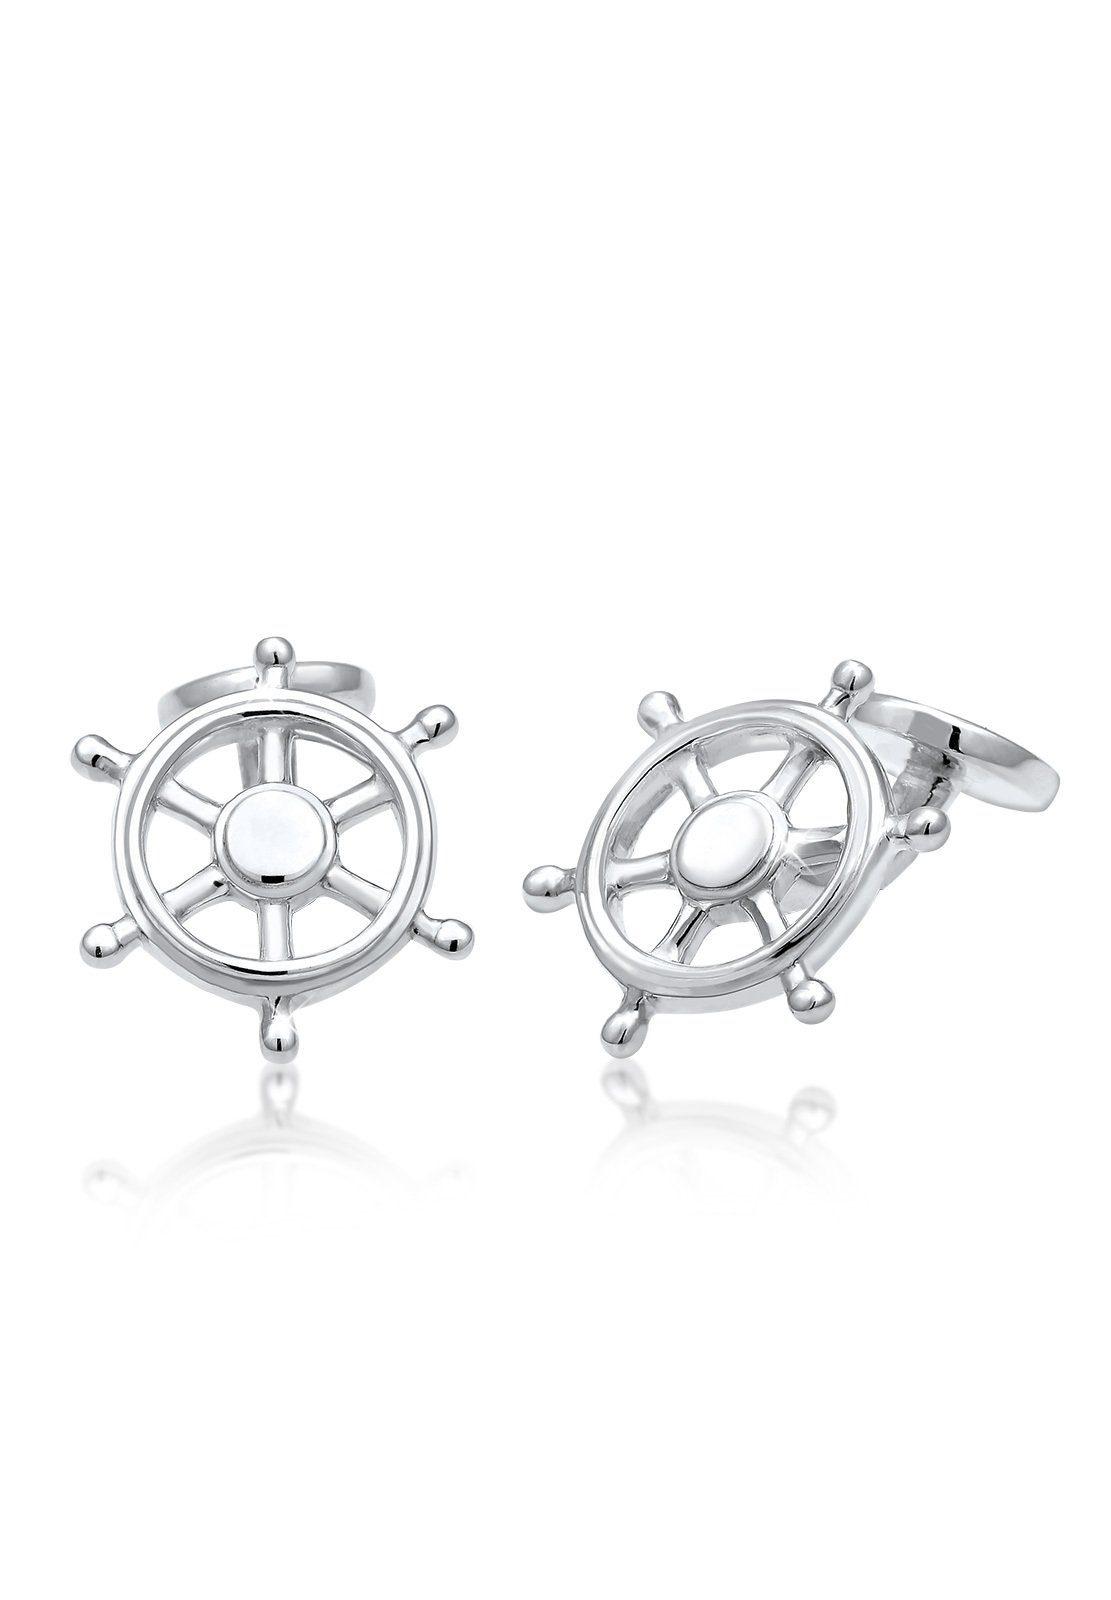 Kuzzoi Manschettenknöpfe Steuerrad Maritim Meer 925 Sterling Silber   Accessoires > Manschettenknöpfe   Kuzzoi